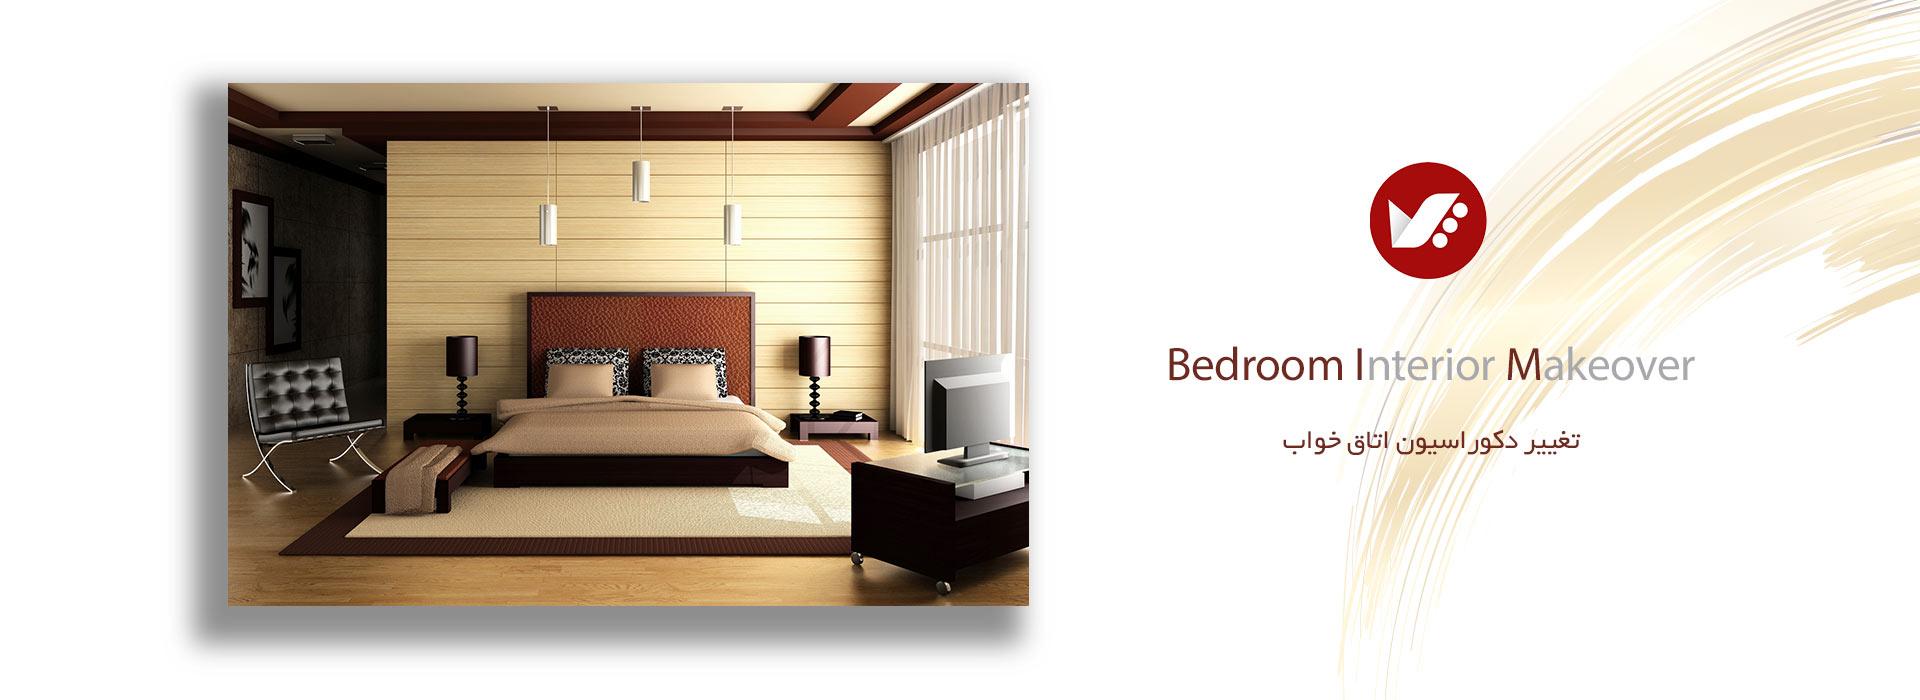 bedroom makeover banner - تغییر دکوراسیون اتاق خواب